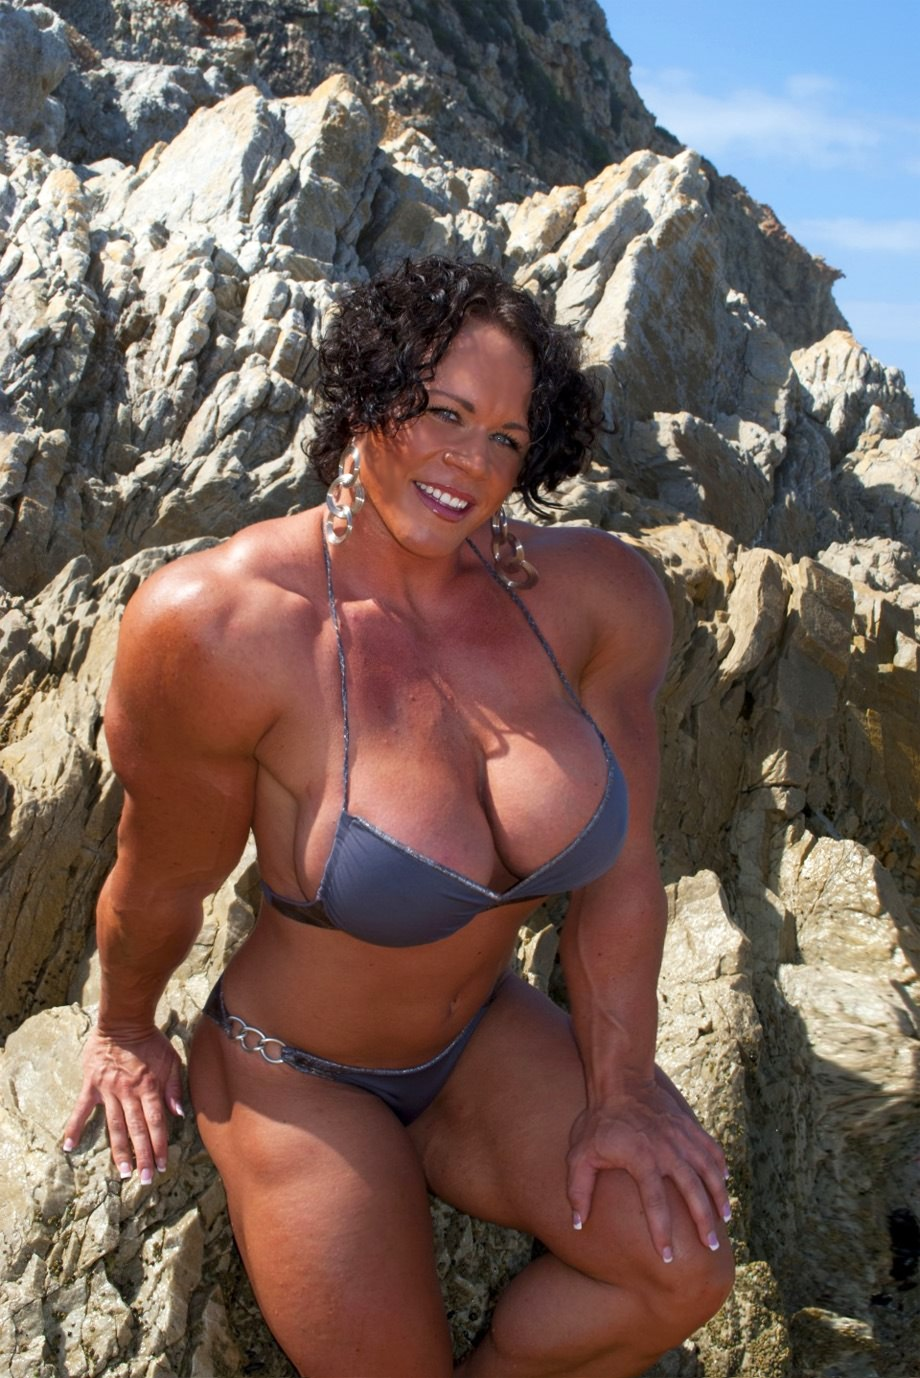 Truly Massive Female Muscle Beast Beach Posing